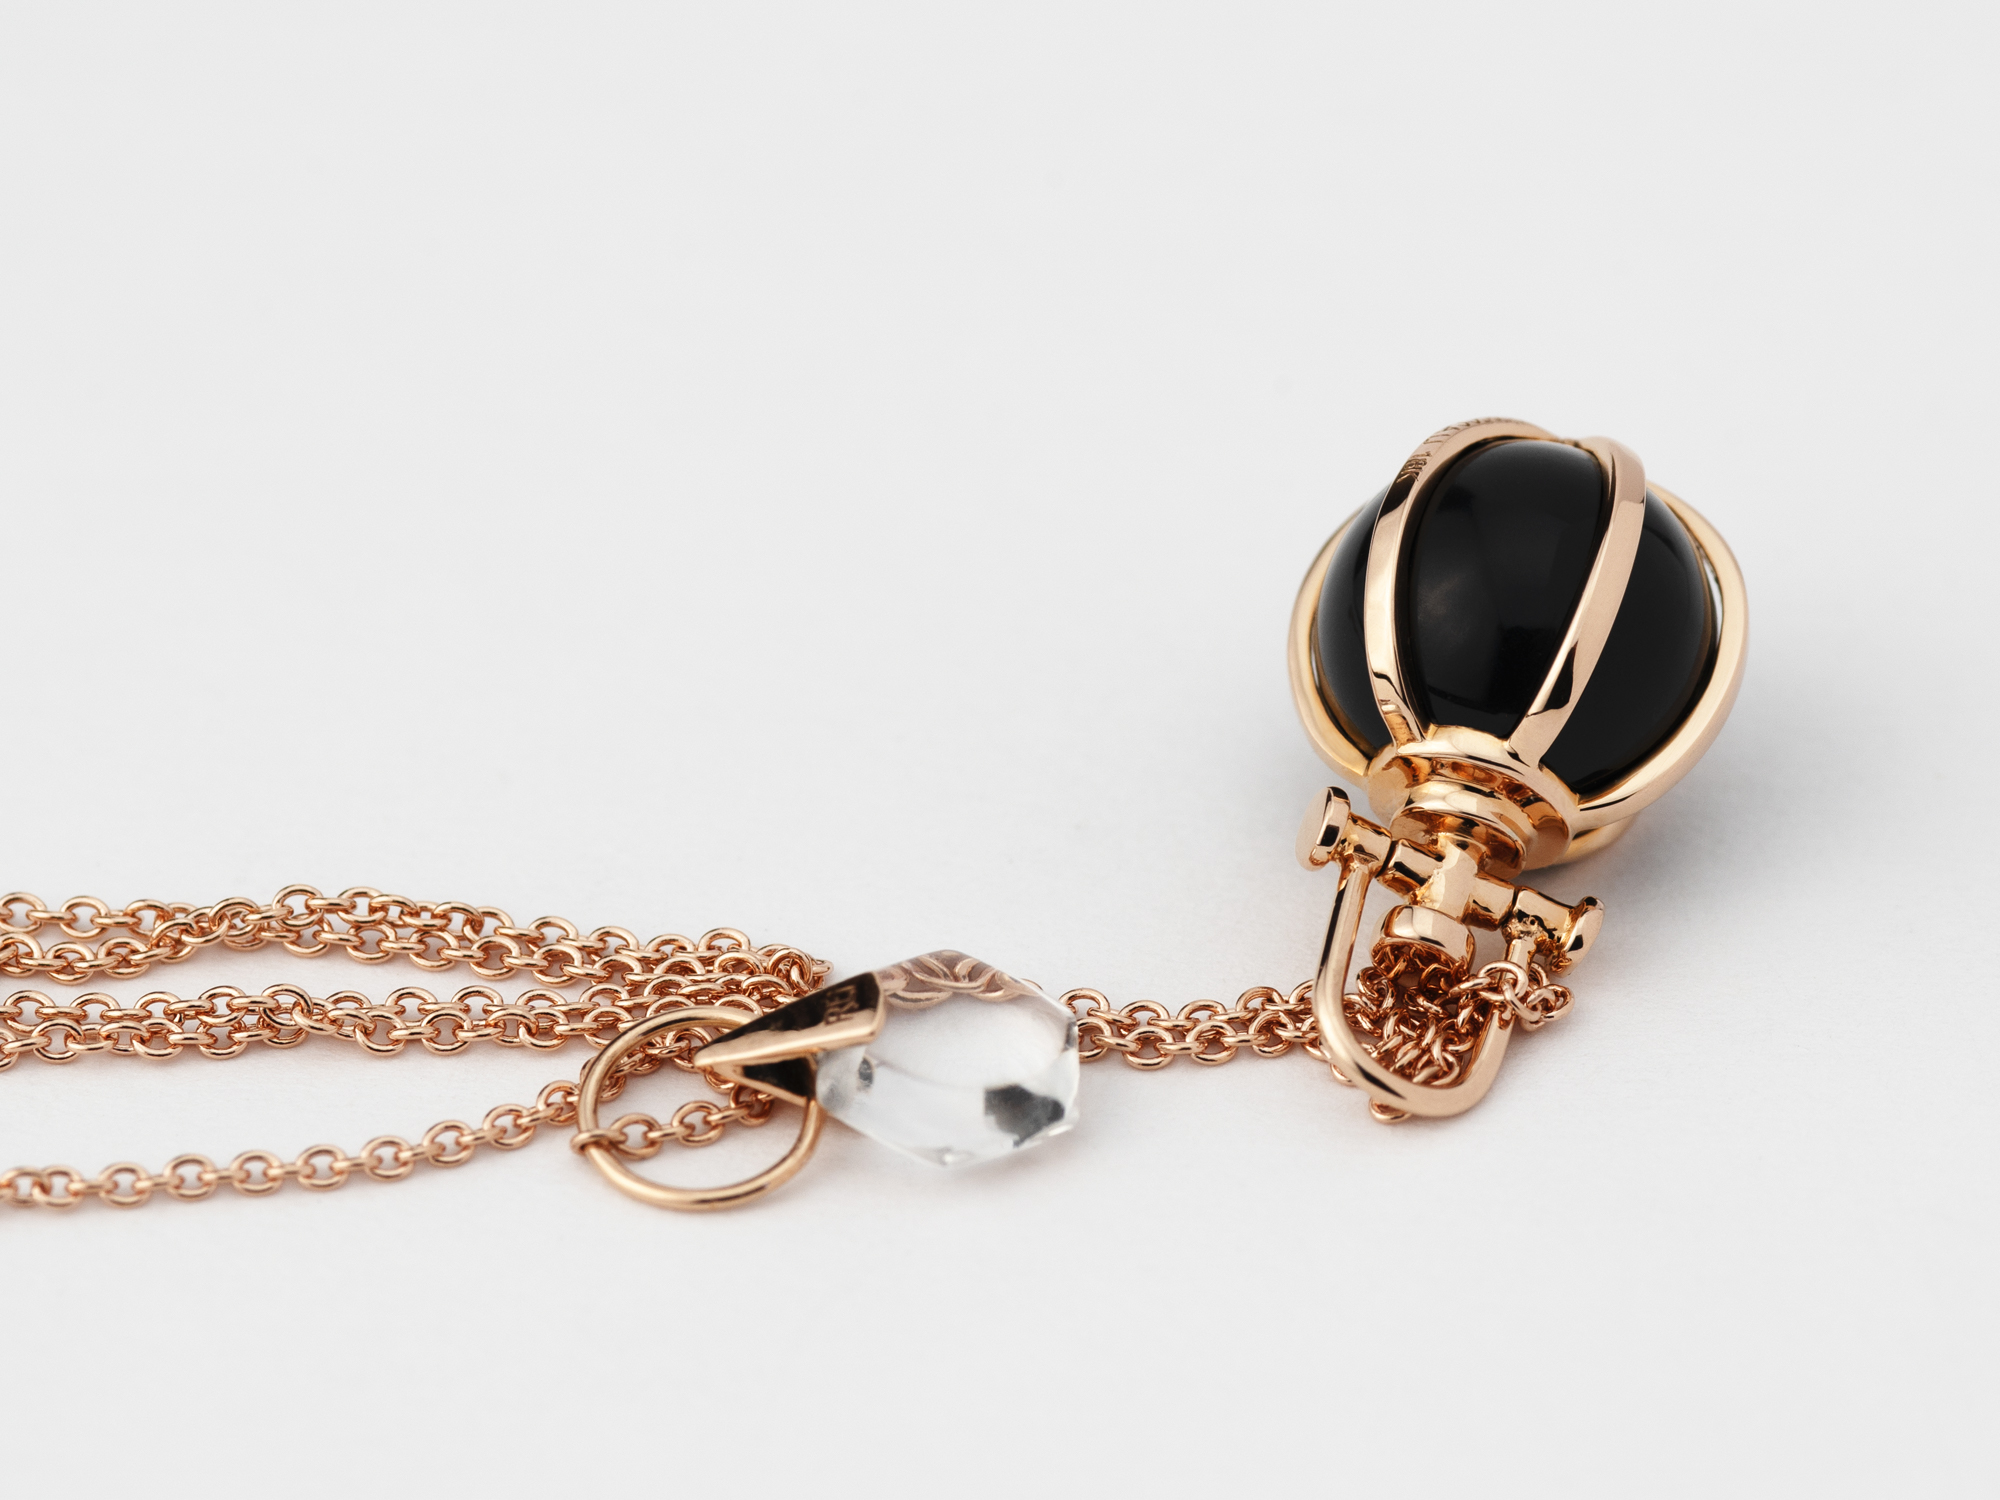 Rebecca Li Mini 18k Rose Gold Crystal Orb Talisman Pendant Necklace with Black Oynx